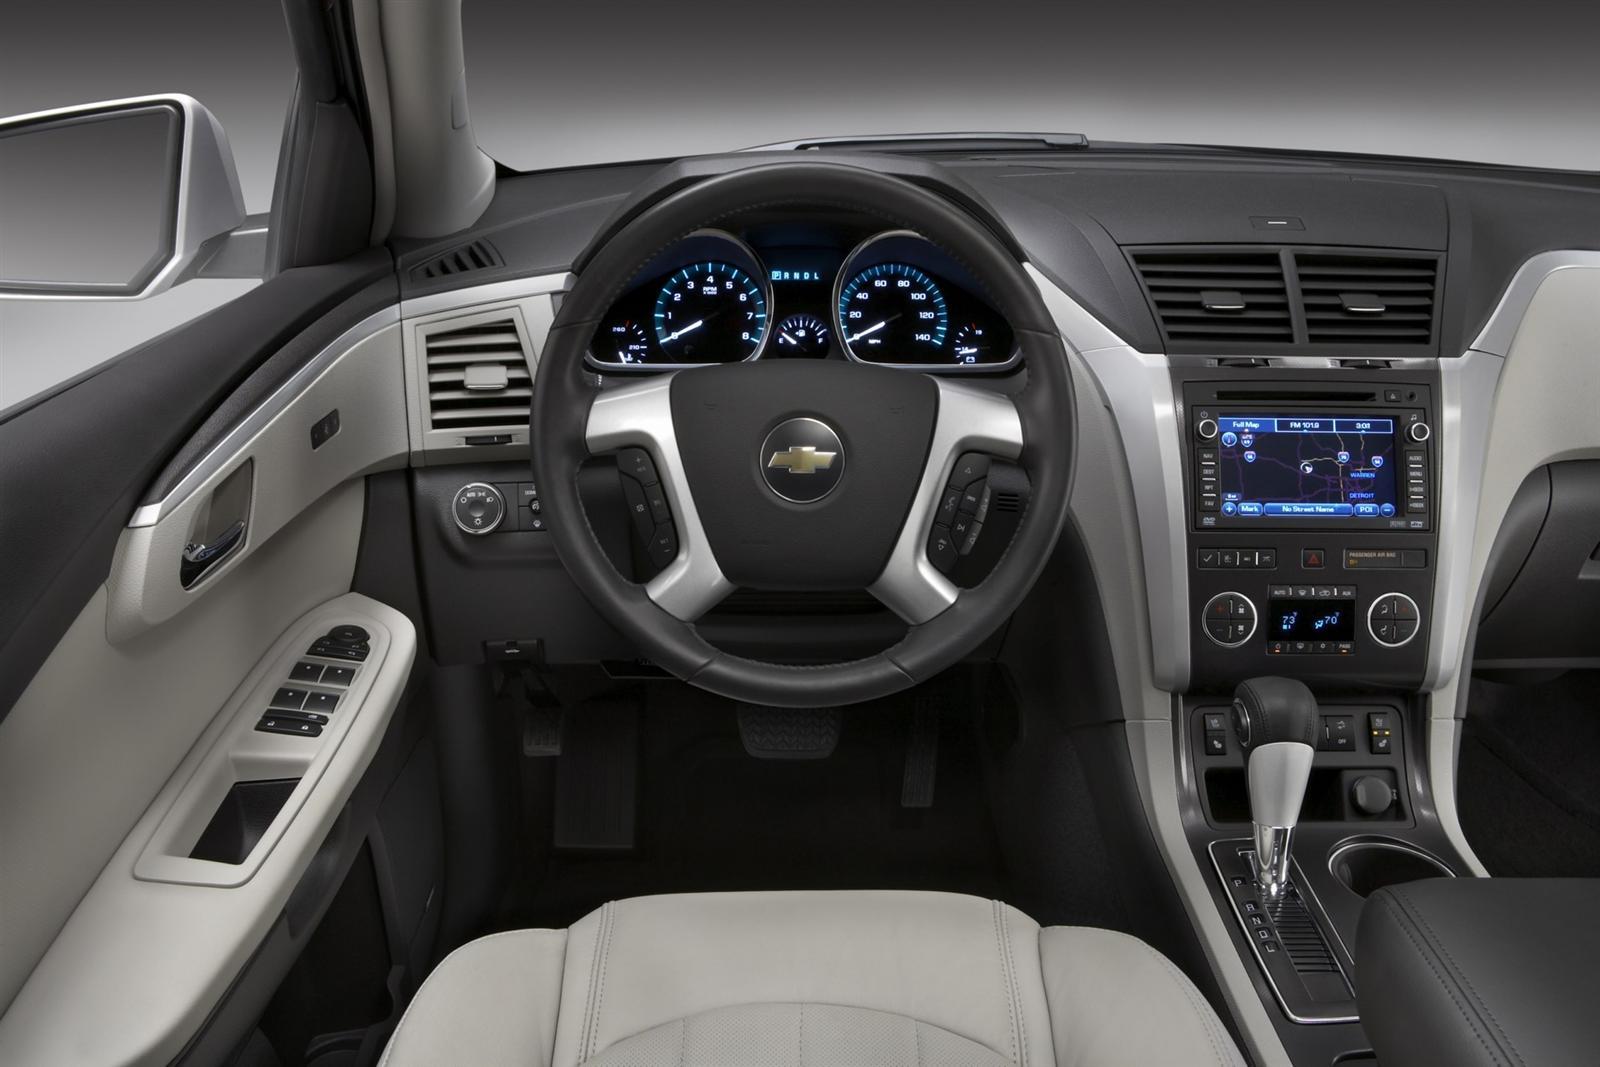 2008 Chevrolet Traverse